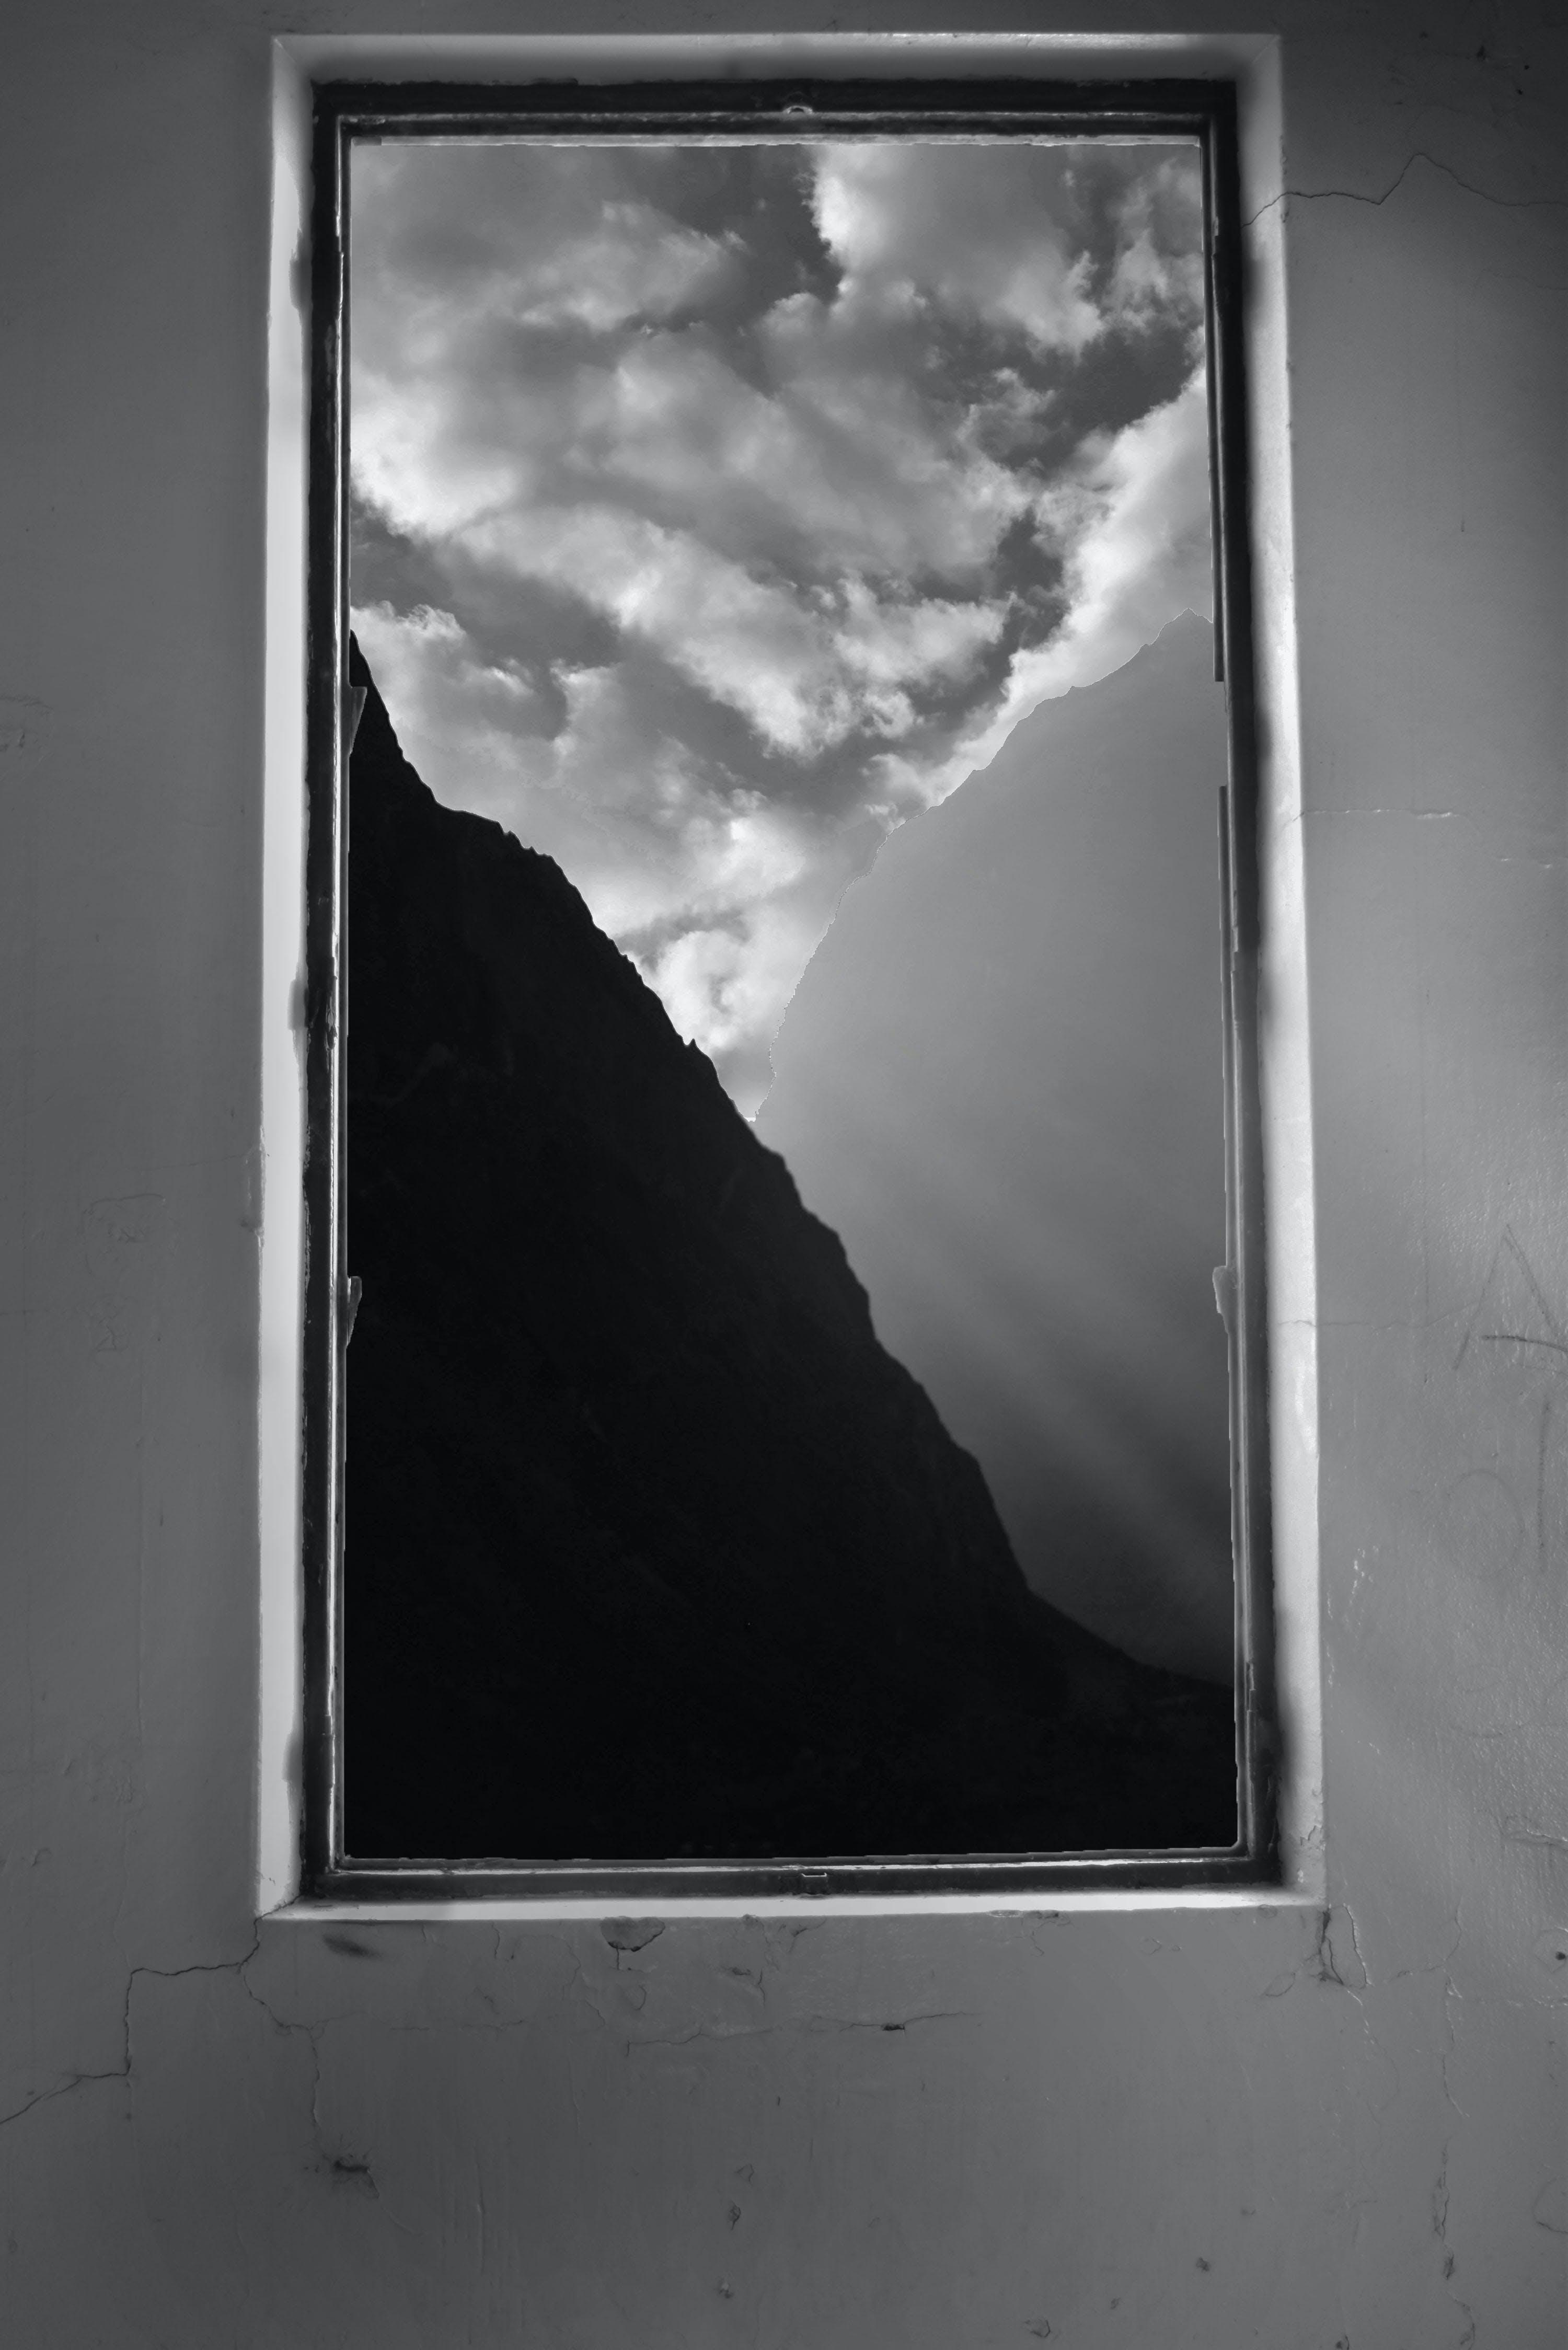 Free stock photo of alone, b&w, cloudy sky, contrast